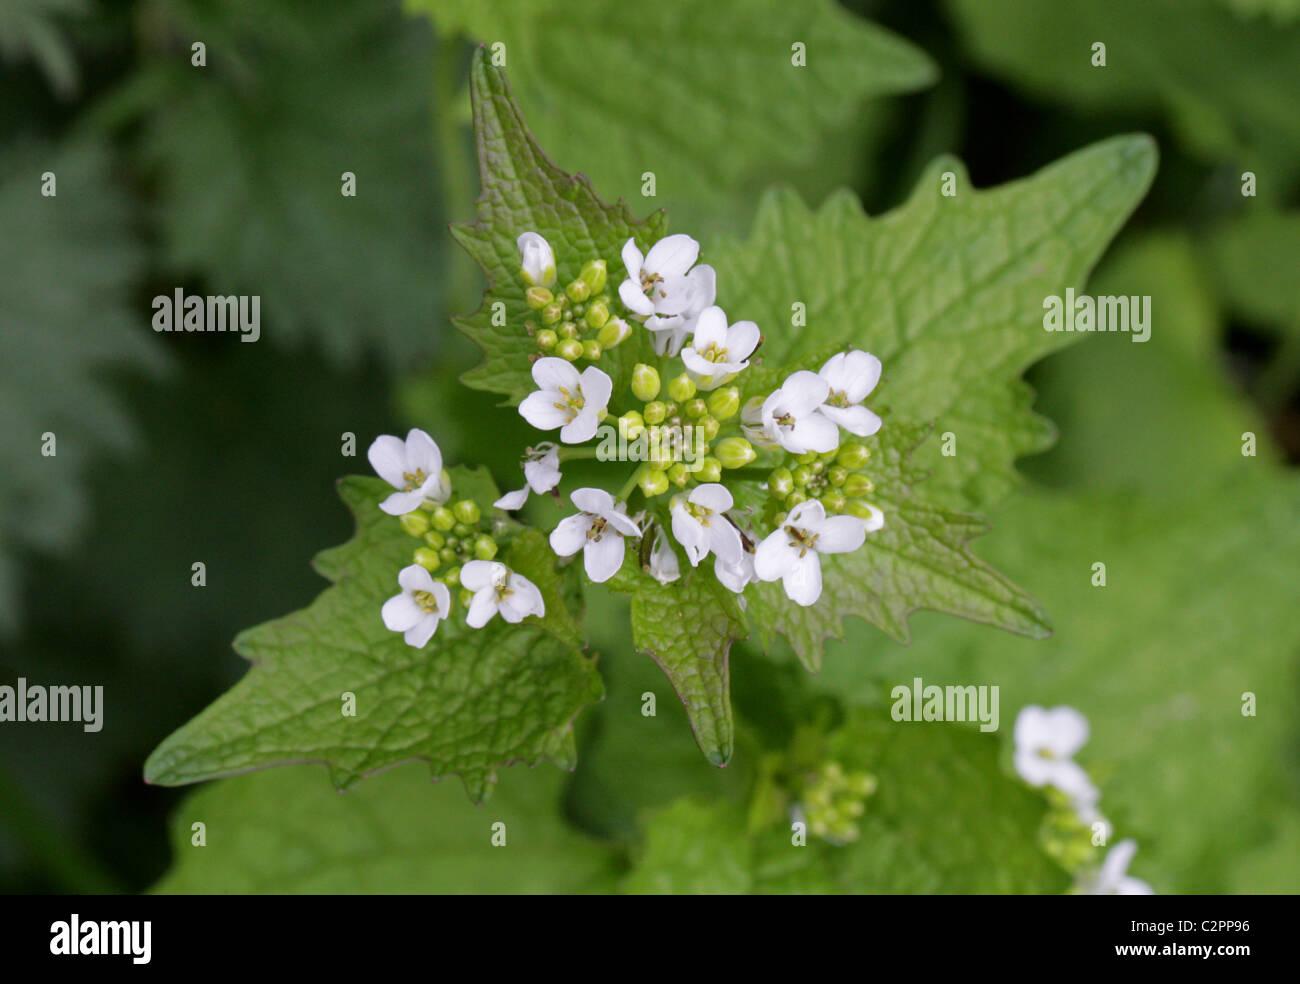 Jack by the Hedge or Garlic Mustard, Alliaria petiolata, Brassicaceae Stock Photo